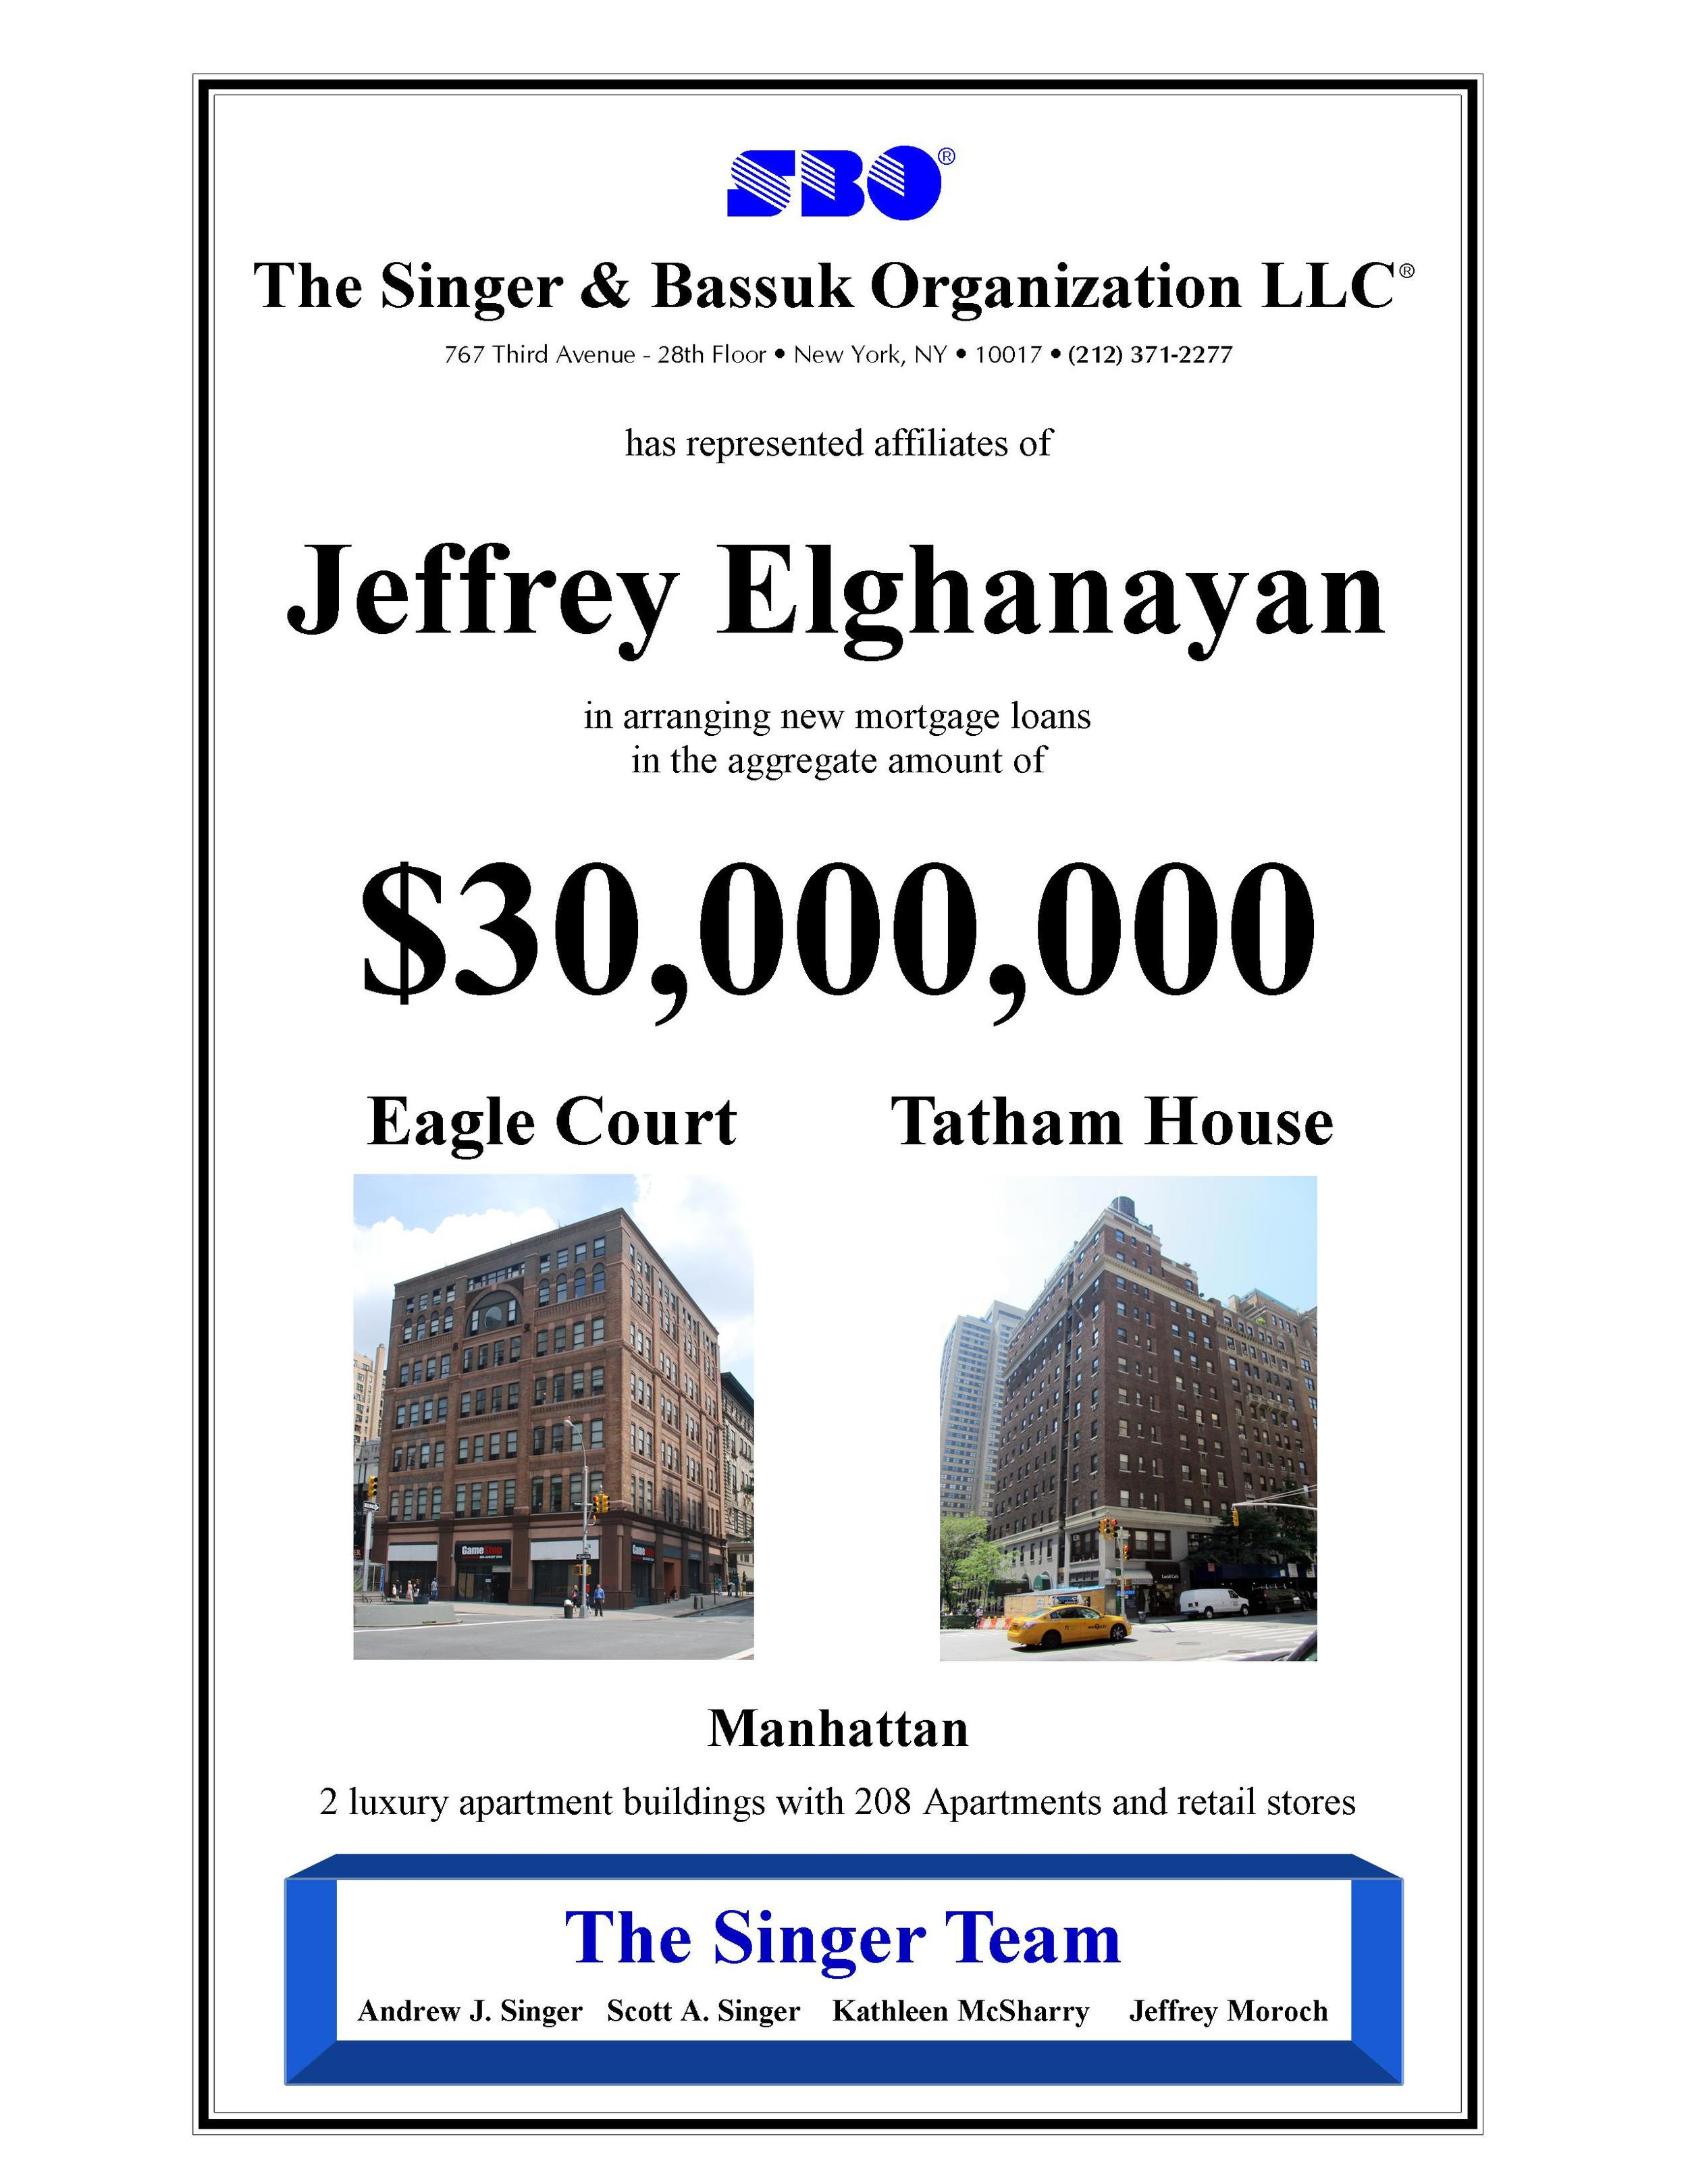 Elghanayan Jeff refi 2012 FINAL (2).jpg